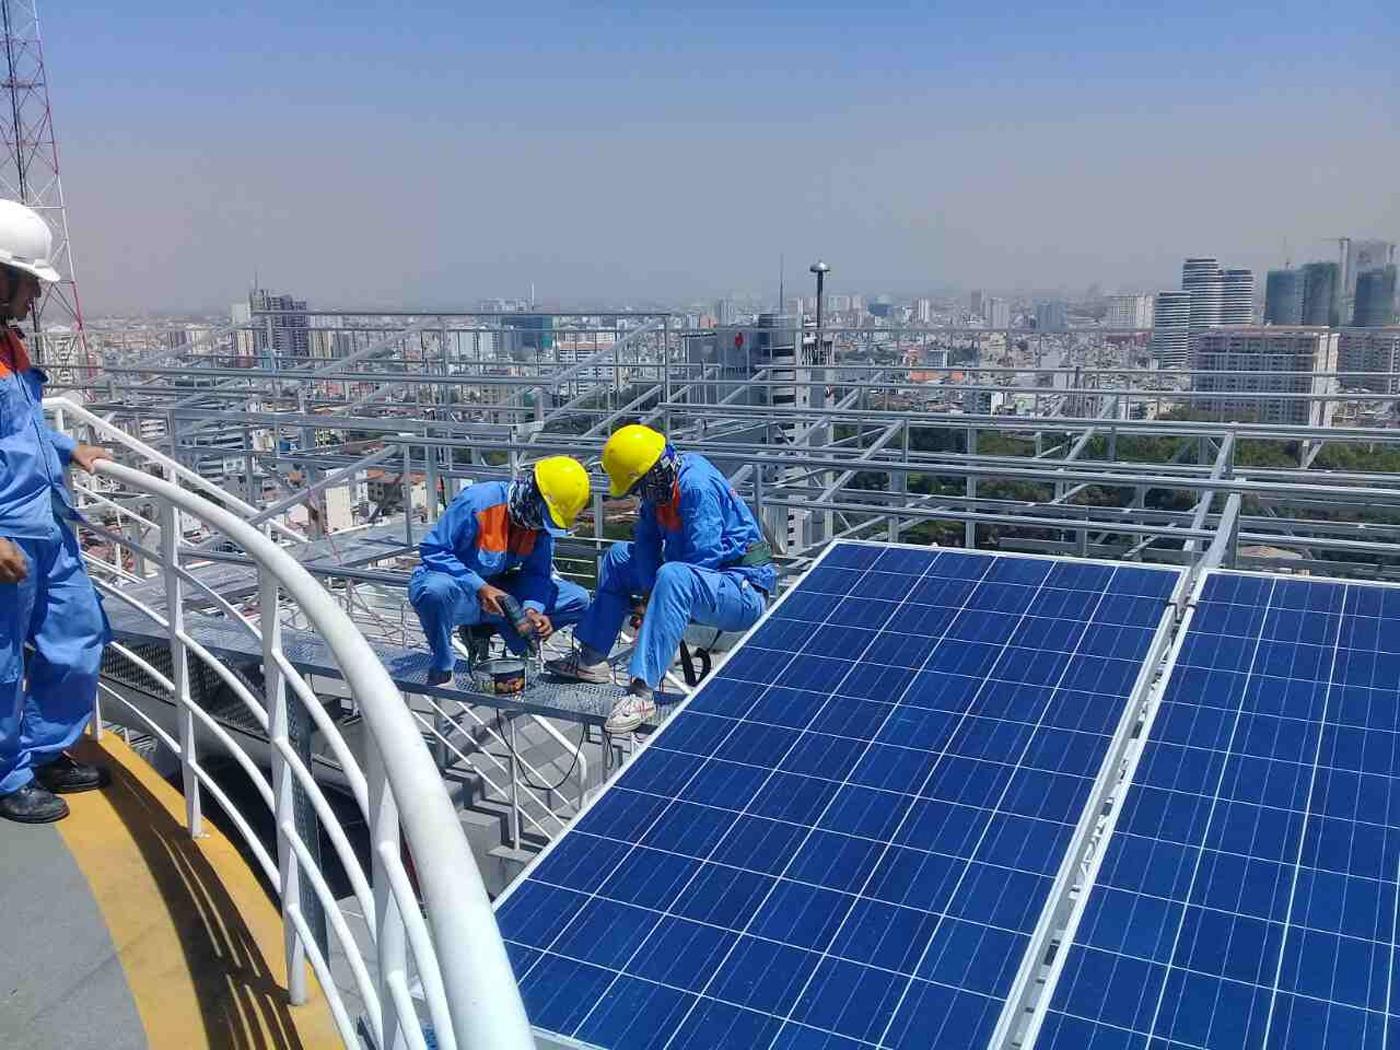 solarbk sets vietnam on greener track